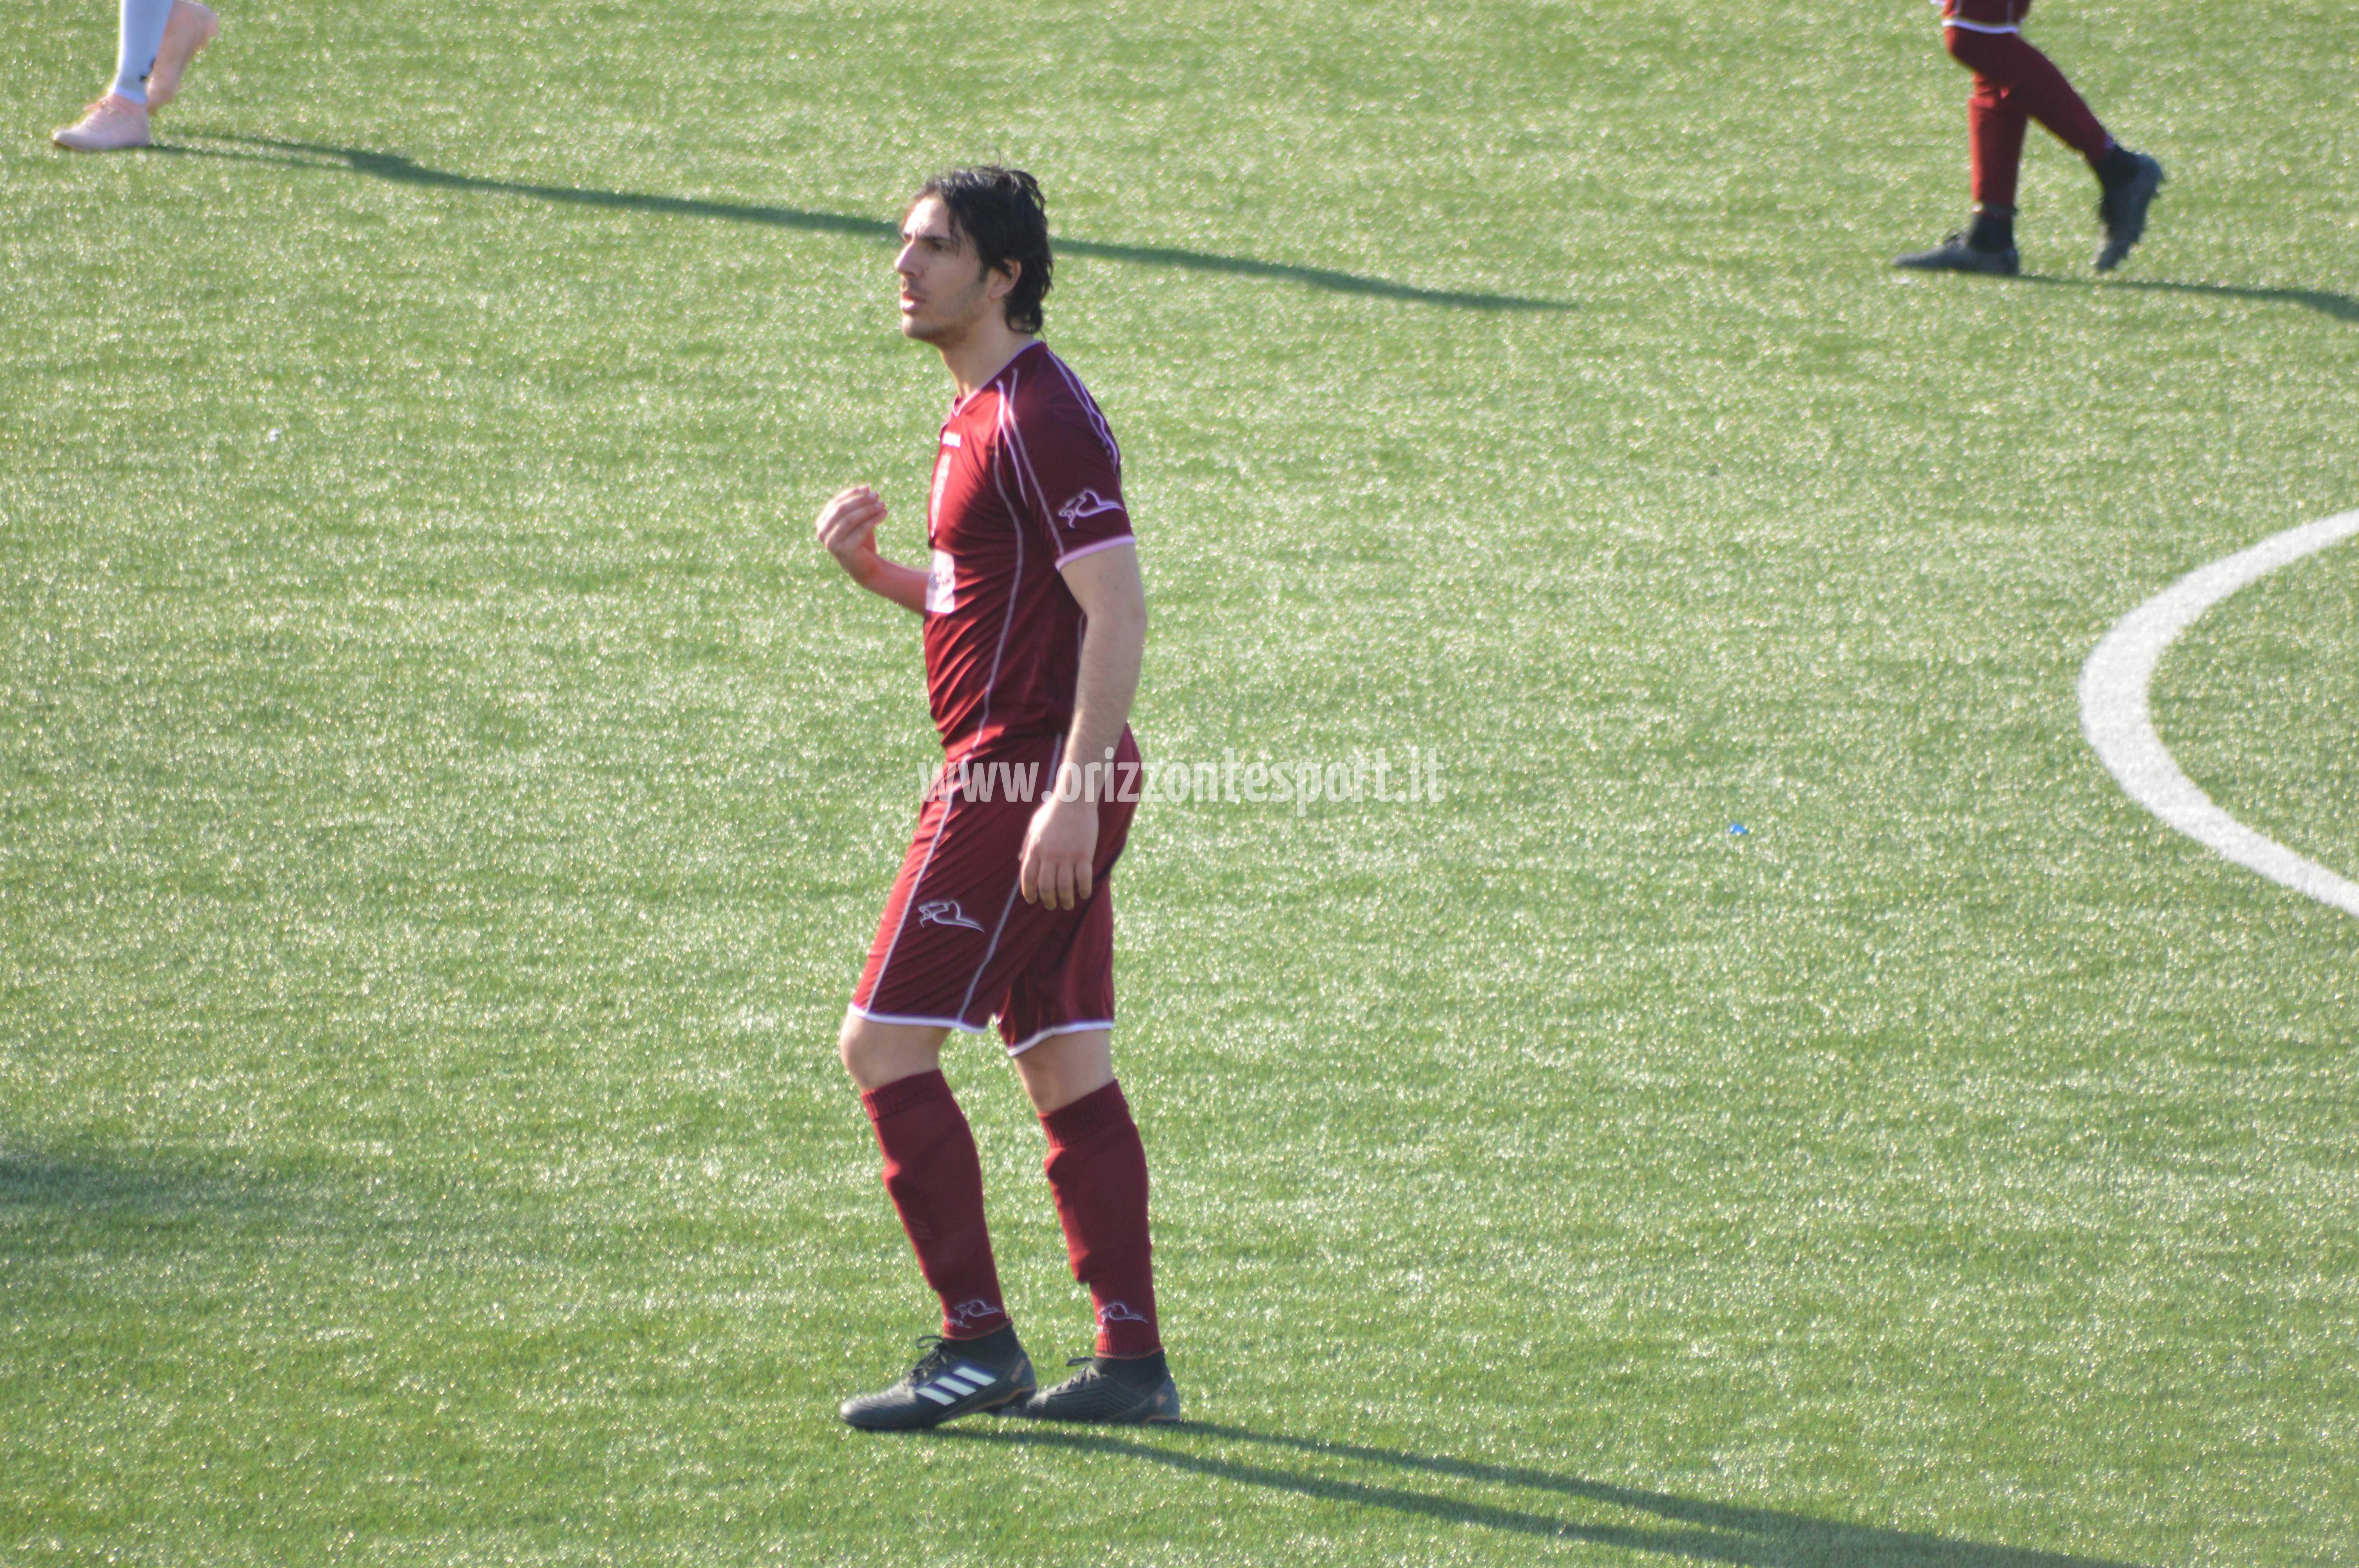 rossanese_belvedere (39)